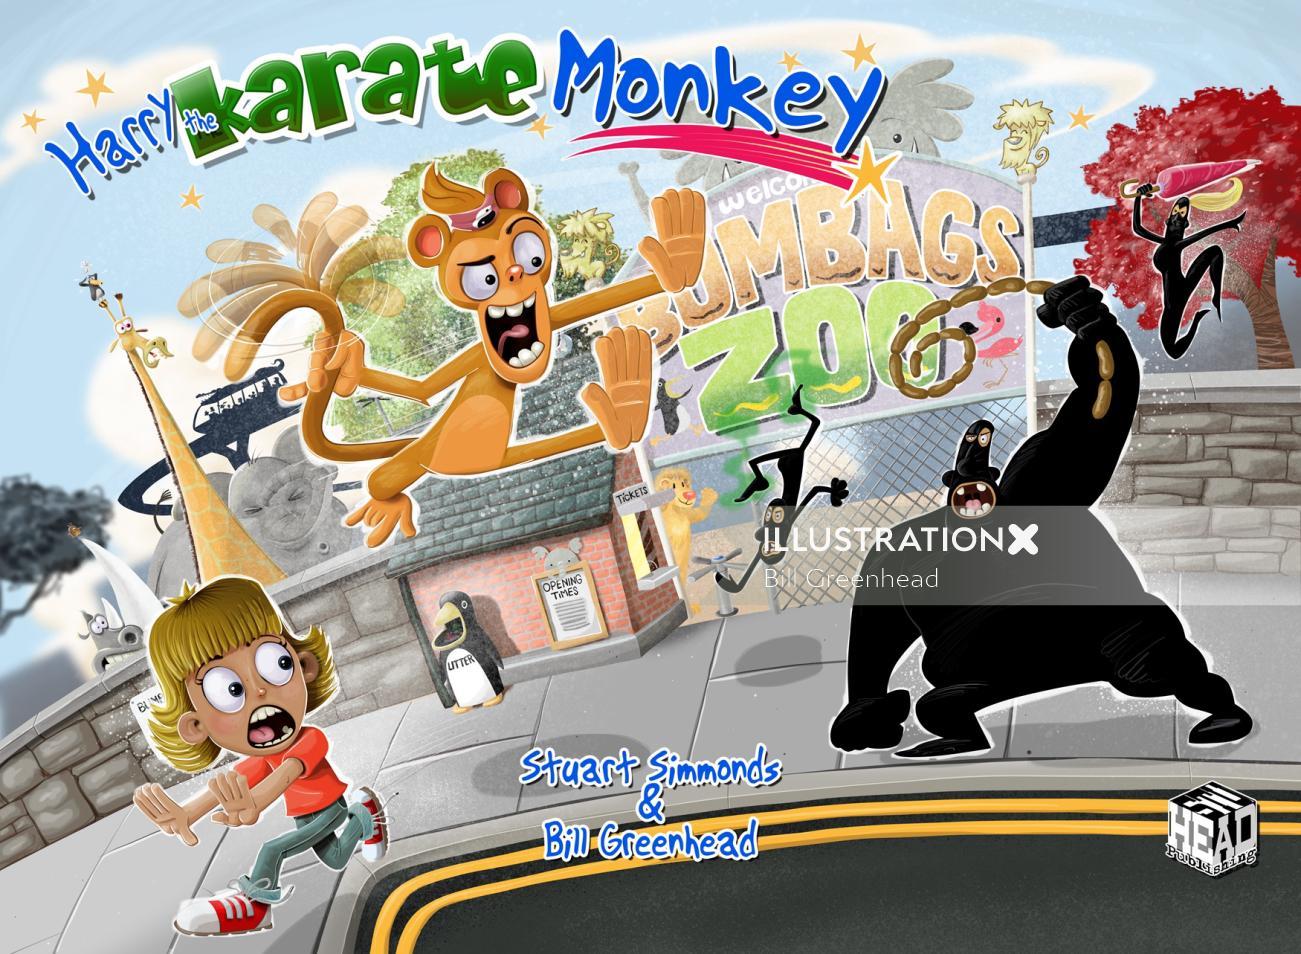 comic art poster Harry the Karate Monkey